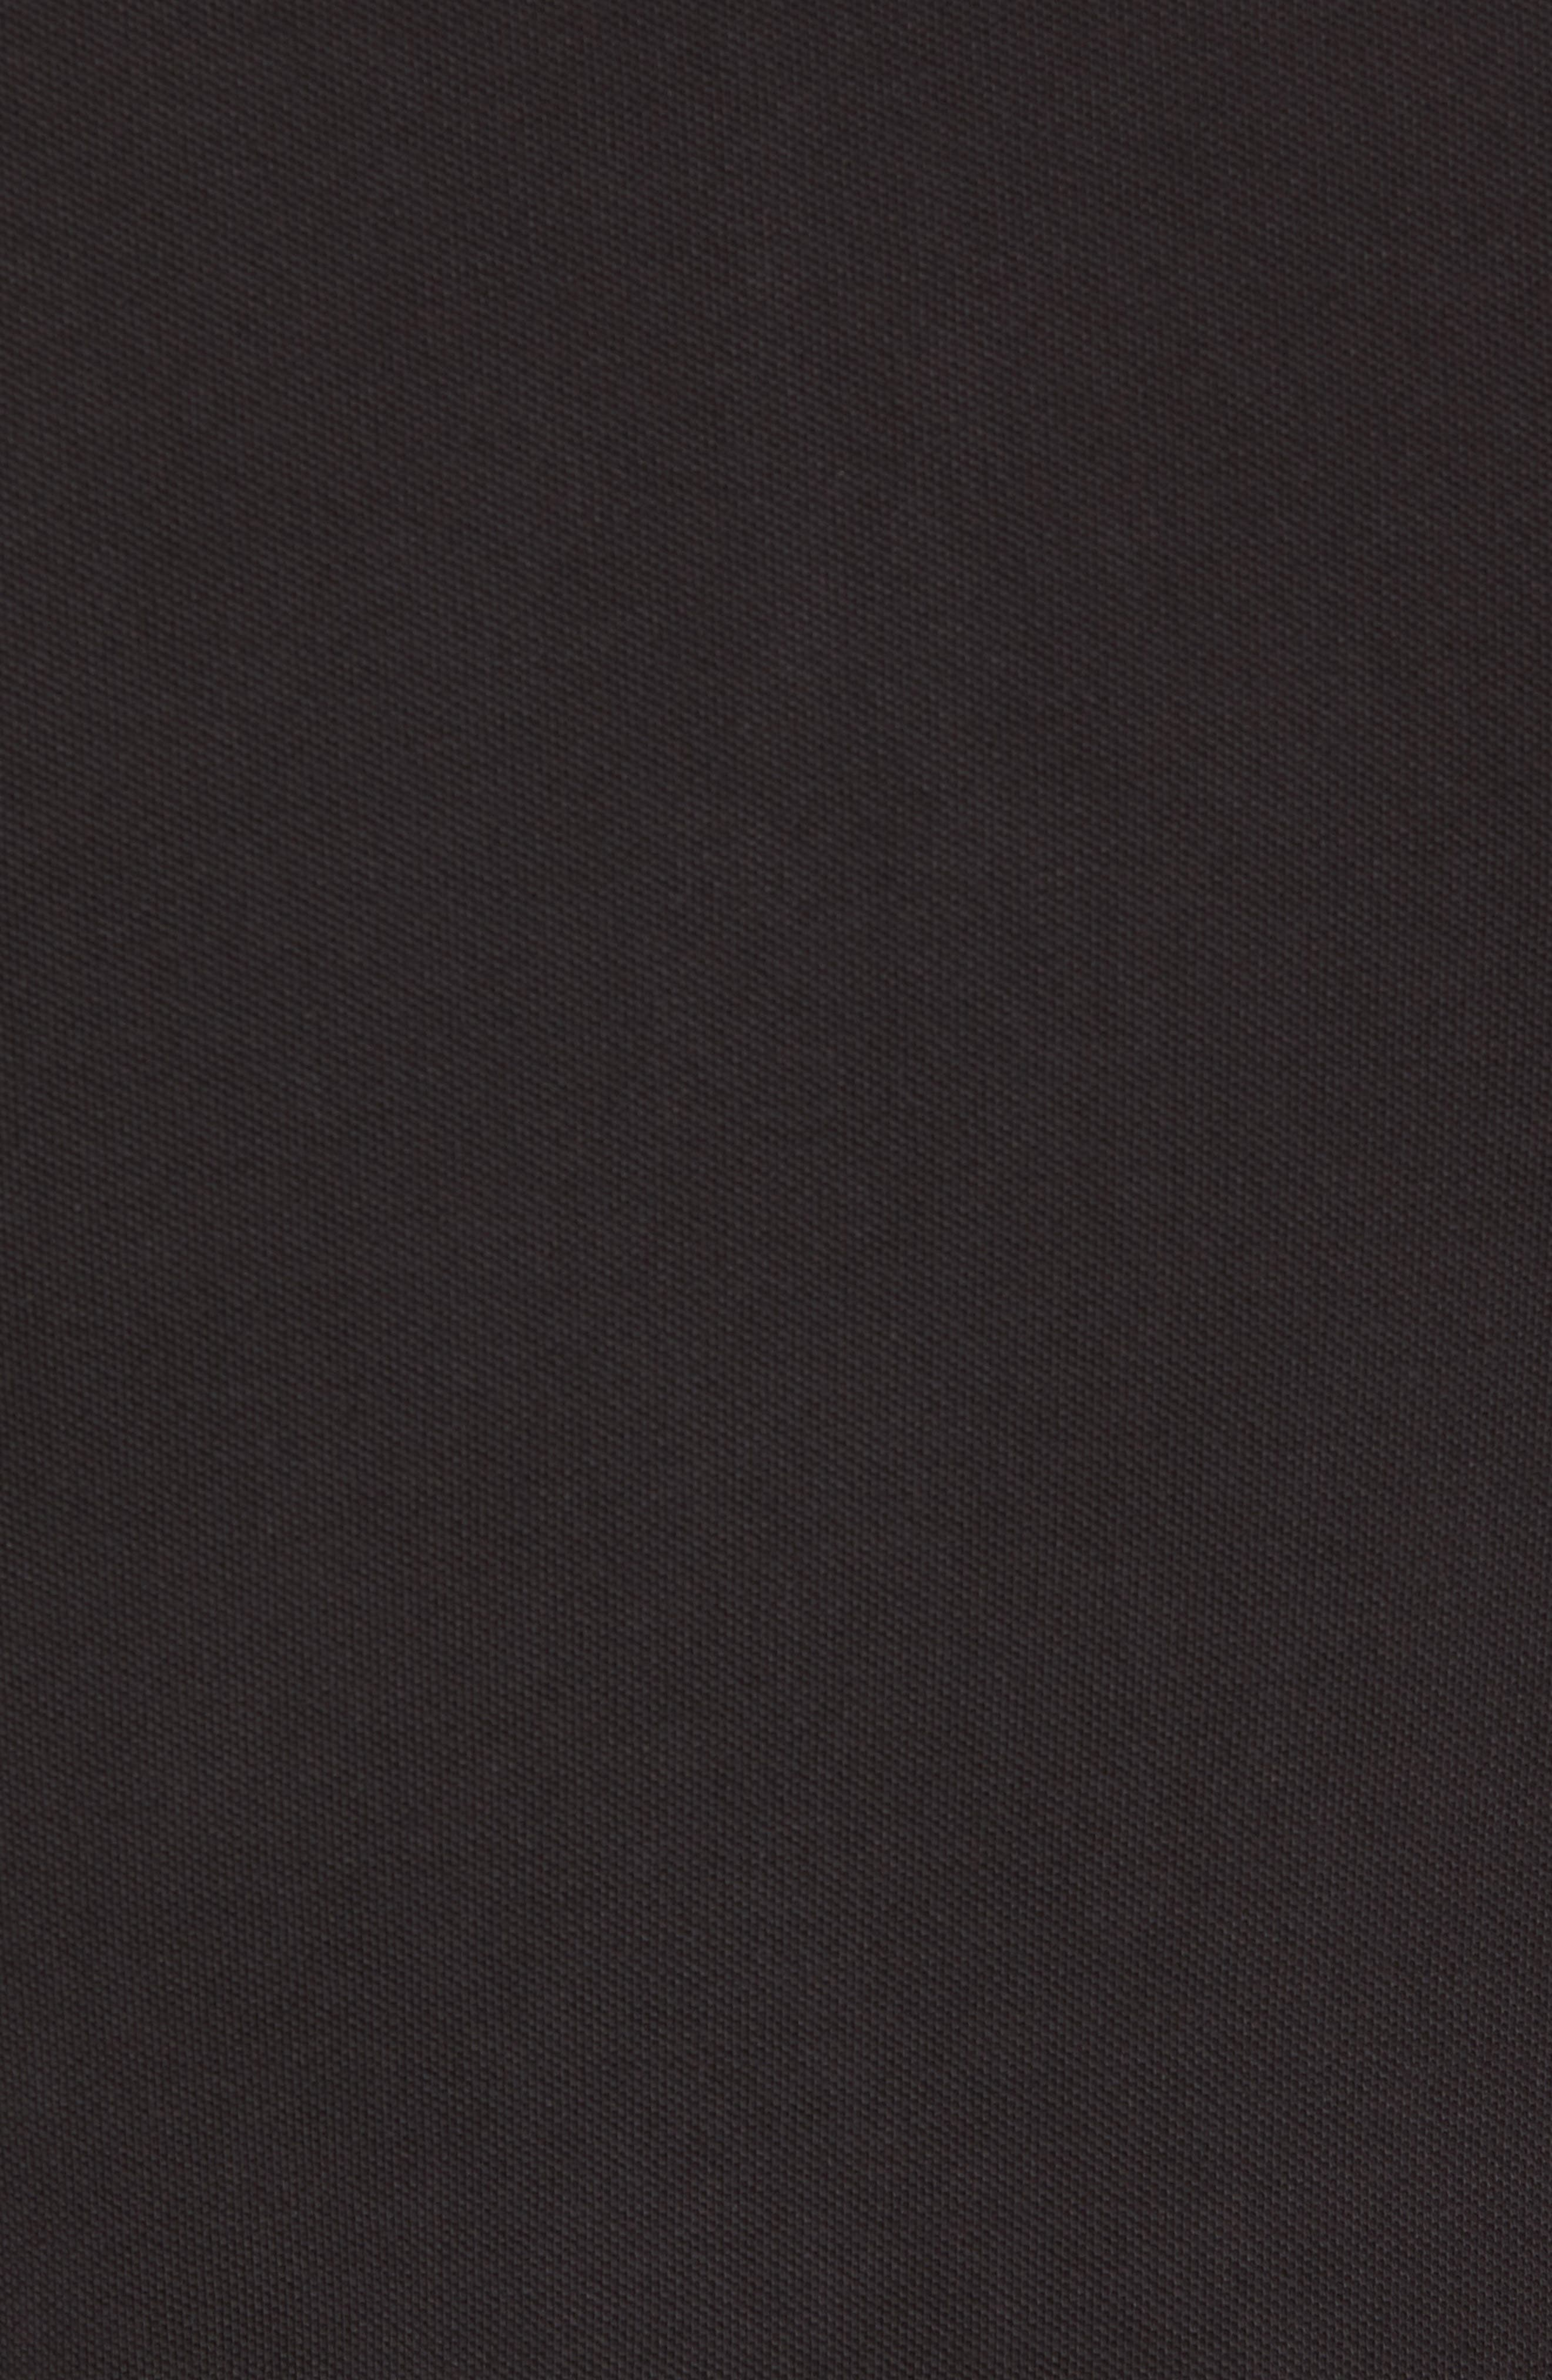 Prime Slim Fit Polo,                             Alternate thumbnail 5, color,                             Black